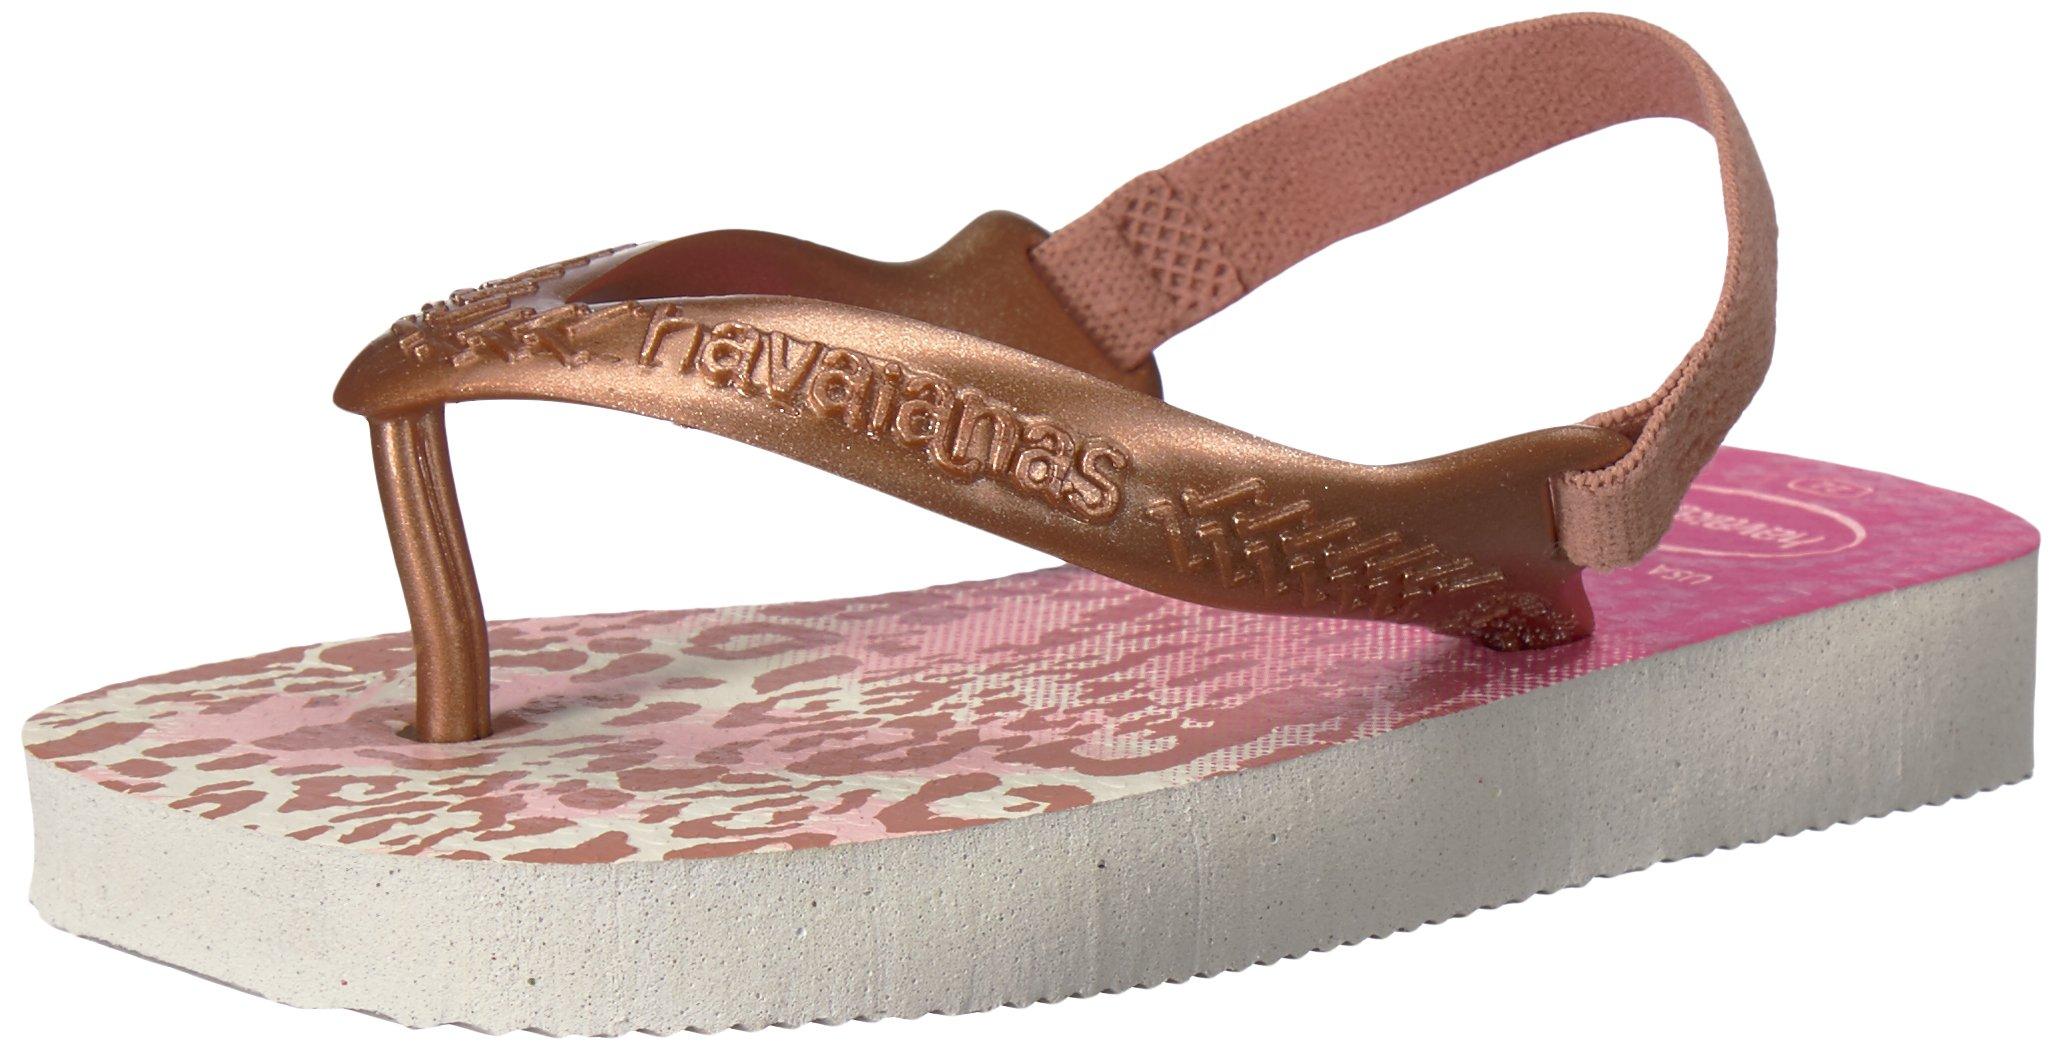 Havaianas Sandal Flip Flop Sandals with Backstrap, Baby/Toddler, Chic,White/Golden Blush,23-24 BR(9 M US Toddler)